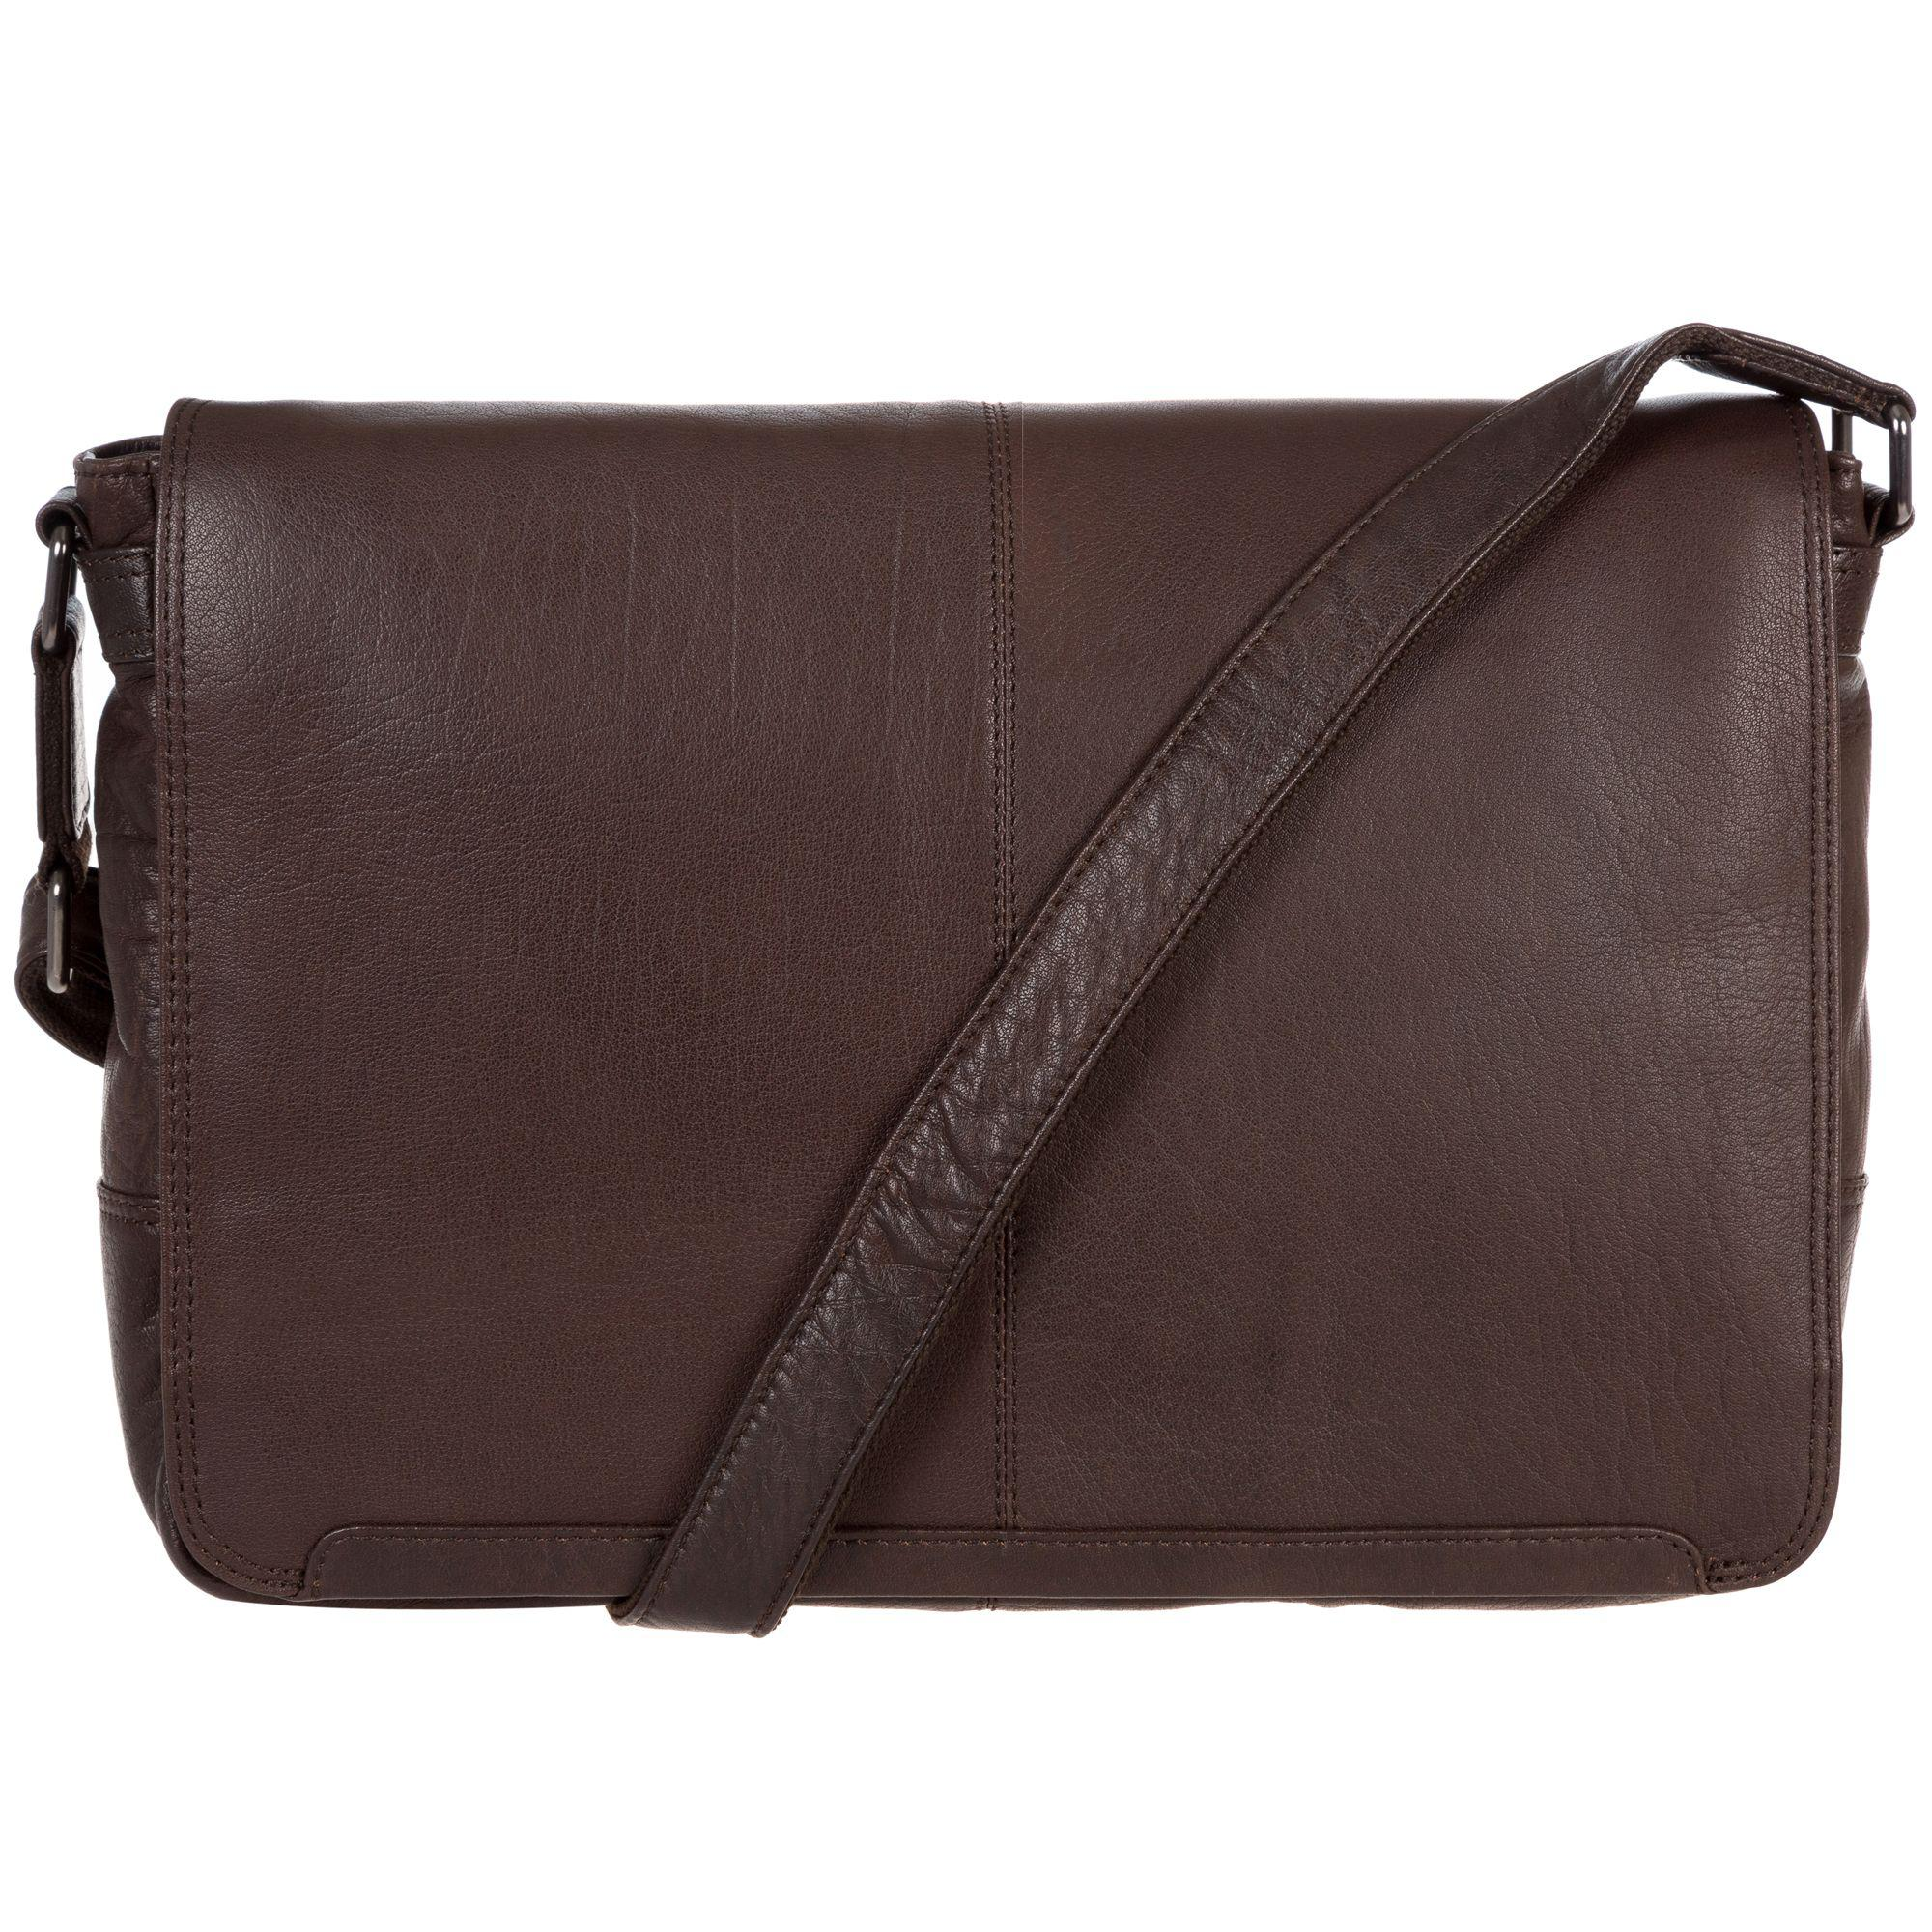 e9cbddc0b8f0 Conkca London Dark Brown  bermondsey  Handcrafted Leather Messenger ...